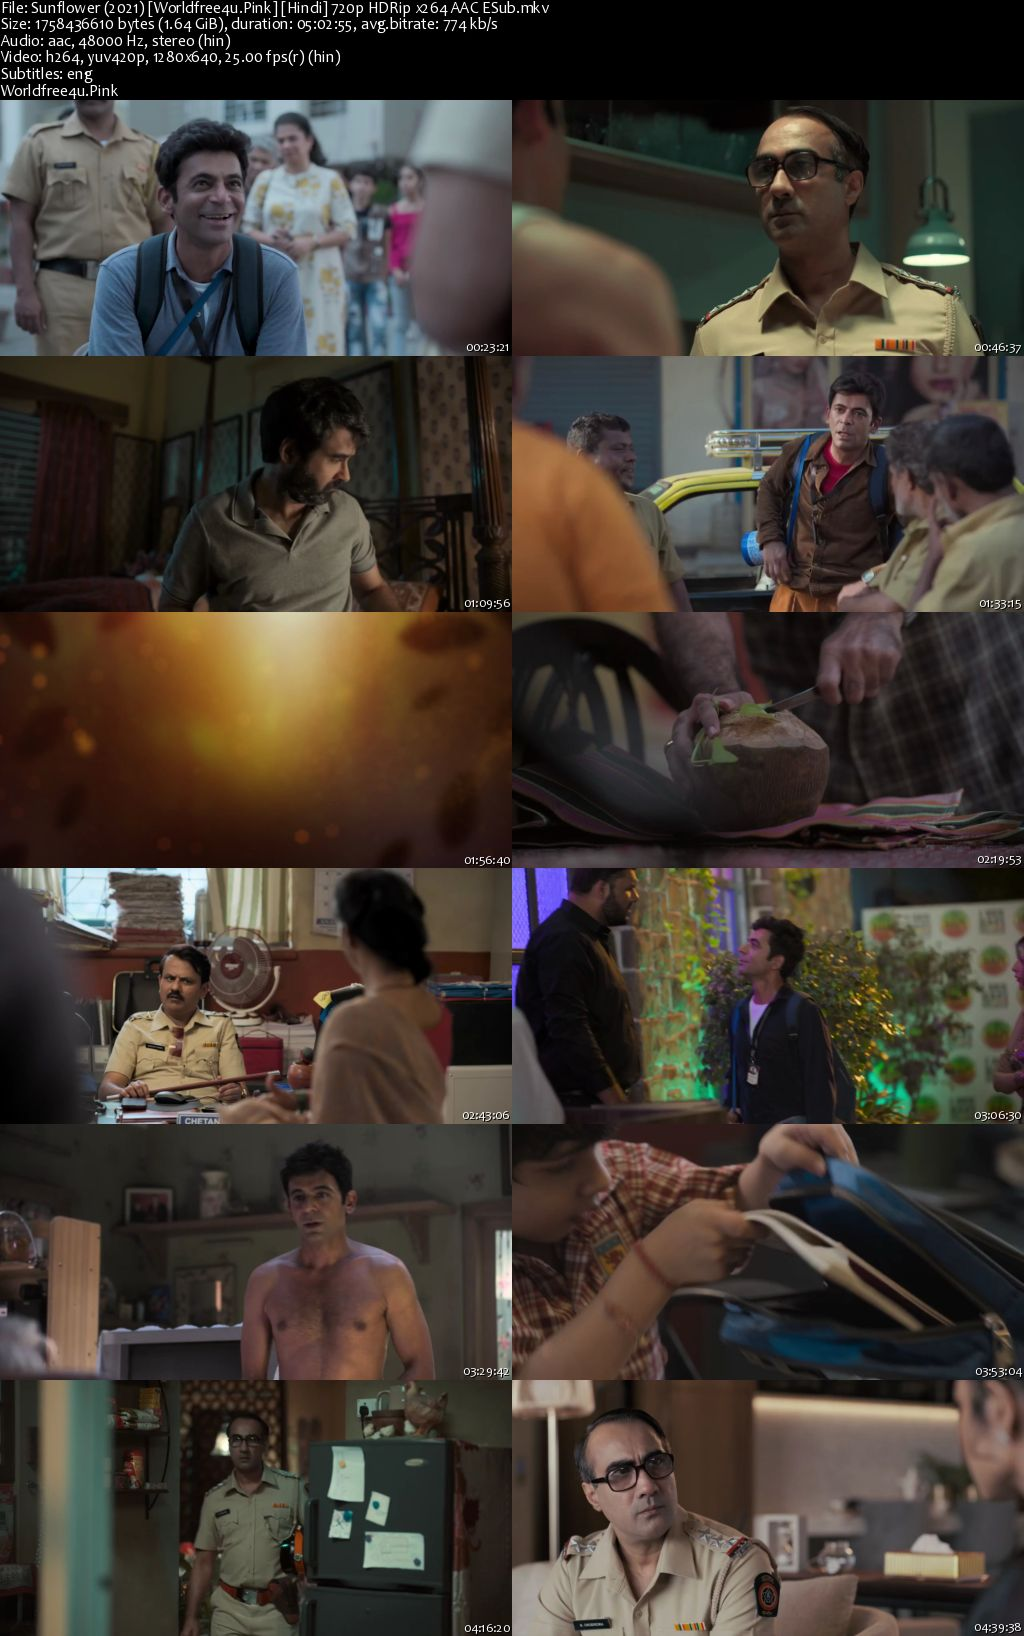 Sunflower 2021 (Season 1) All Episodes HDRip 720p